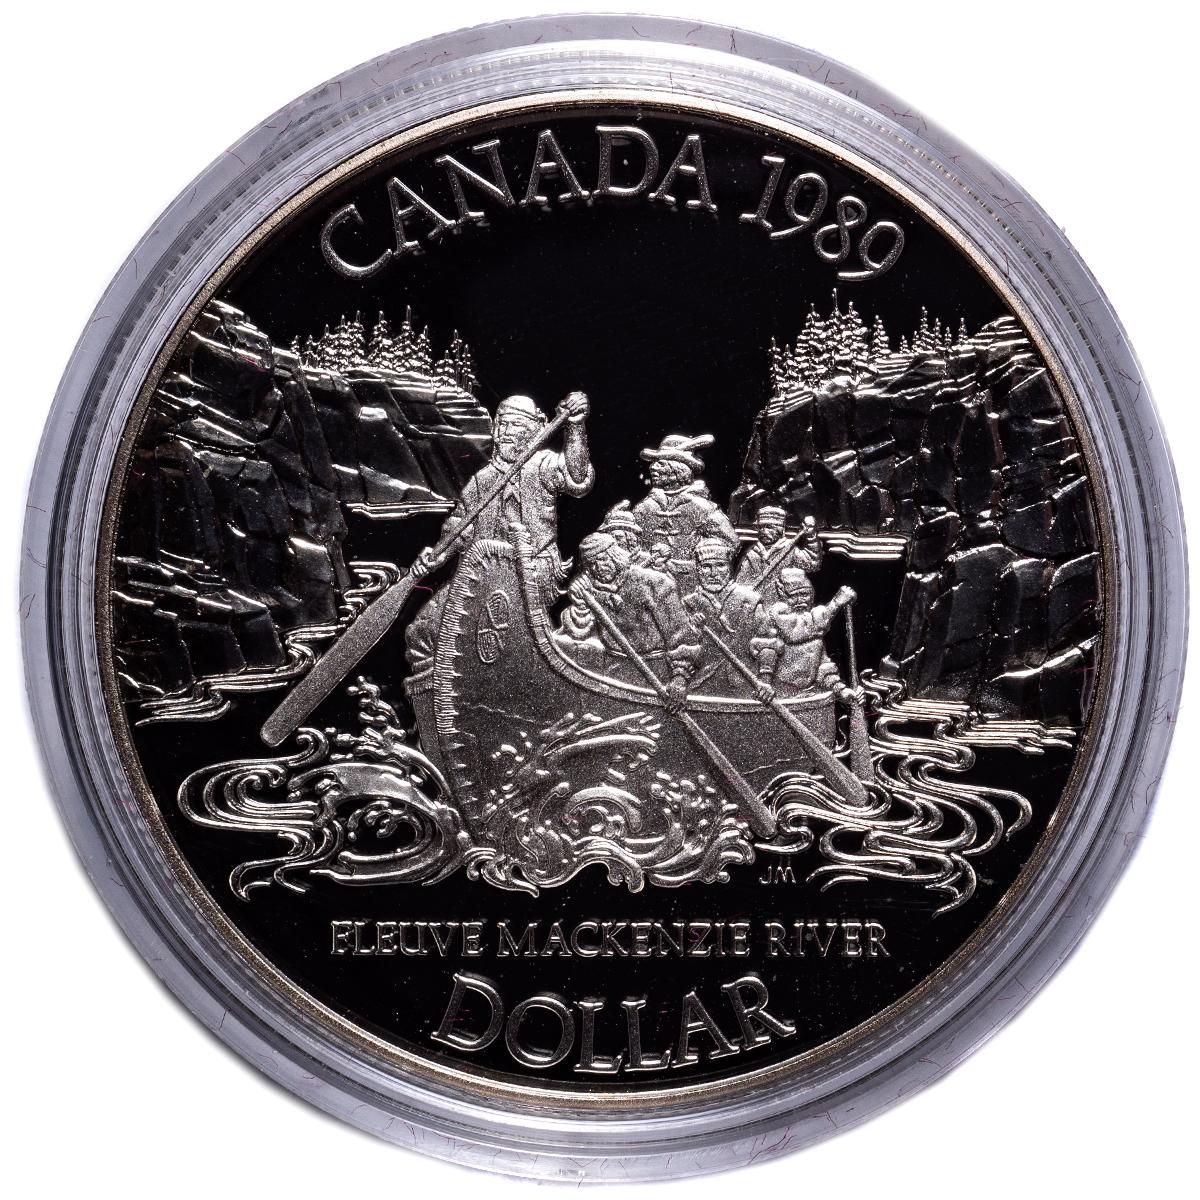 1989 CANADA MACKENZIE RIVER PROOF SILVER DOLLAR COIN